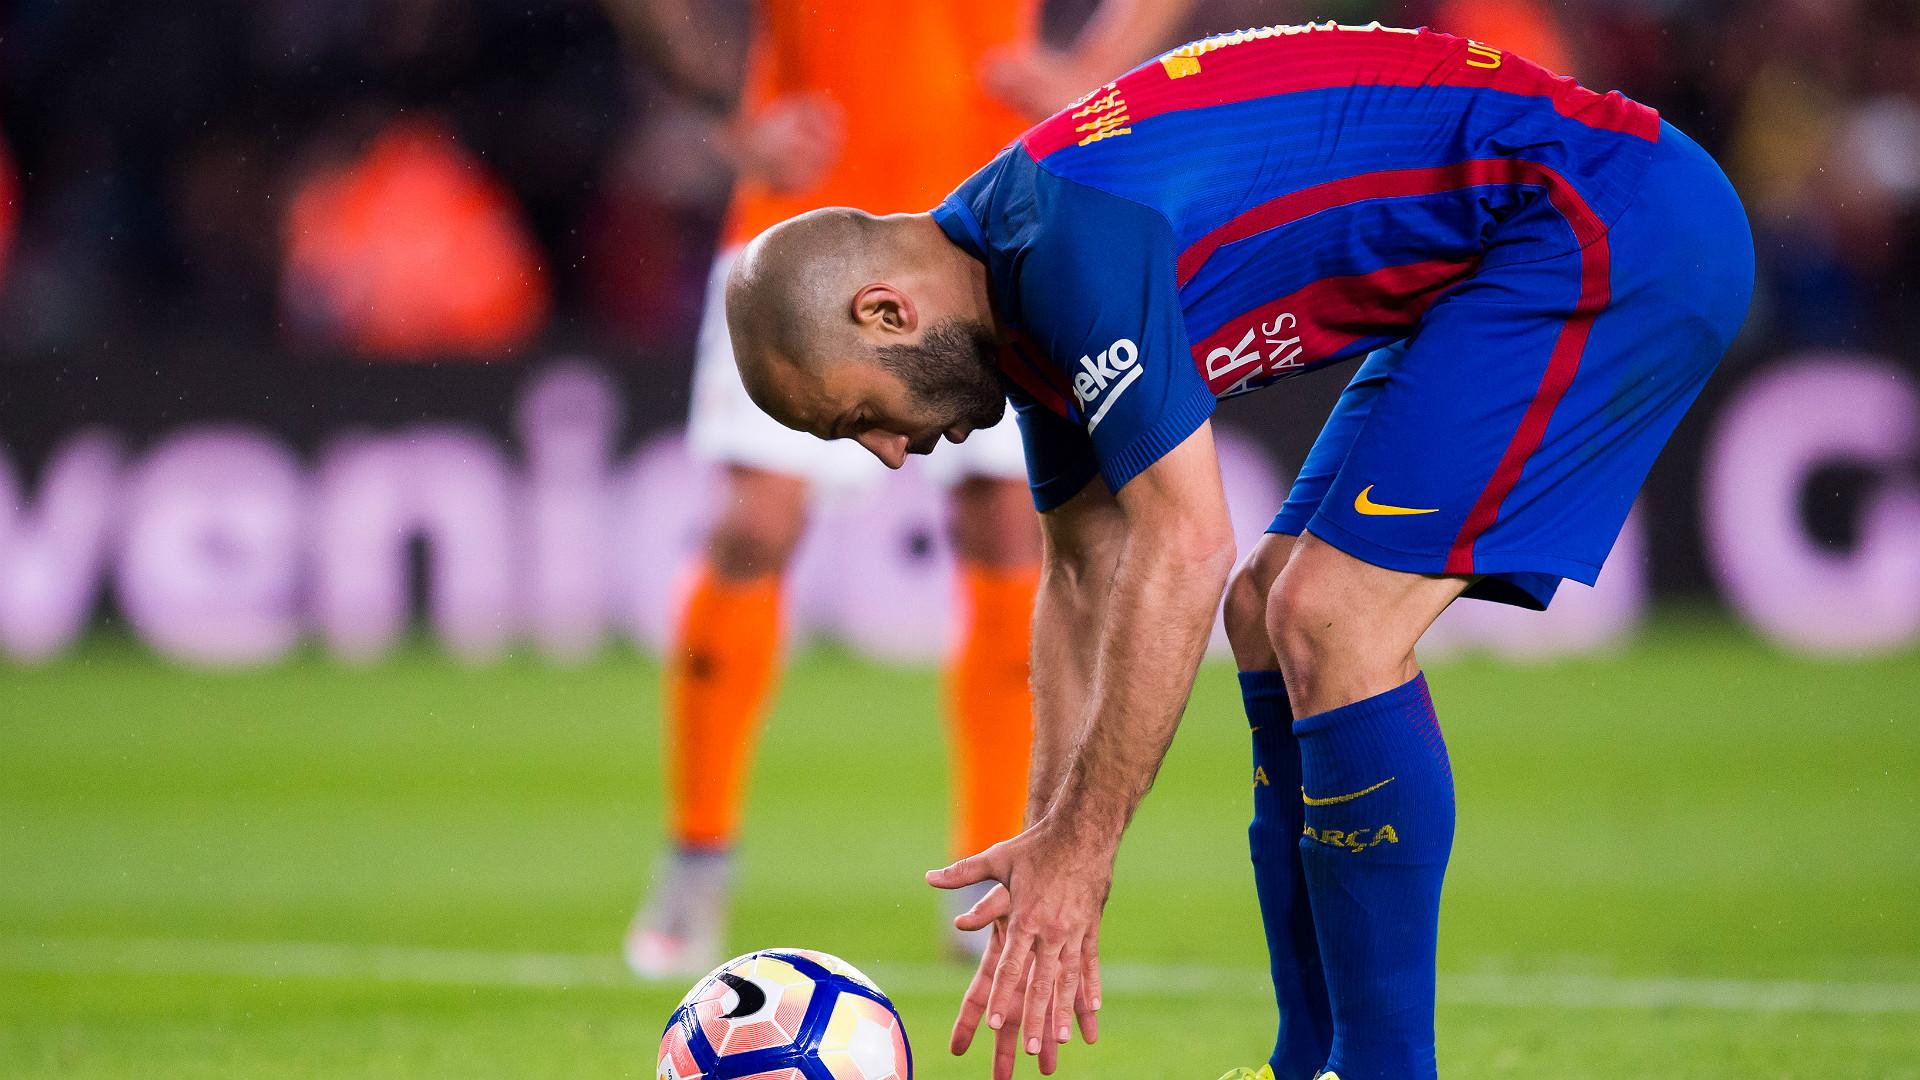 El Camp Nou le dedicó una despedida a Mascherano